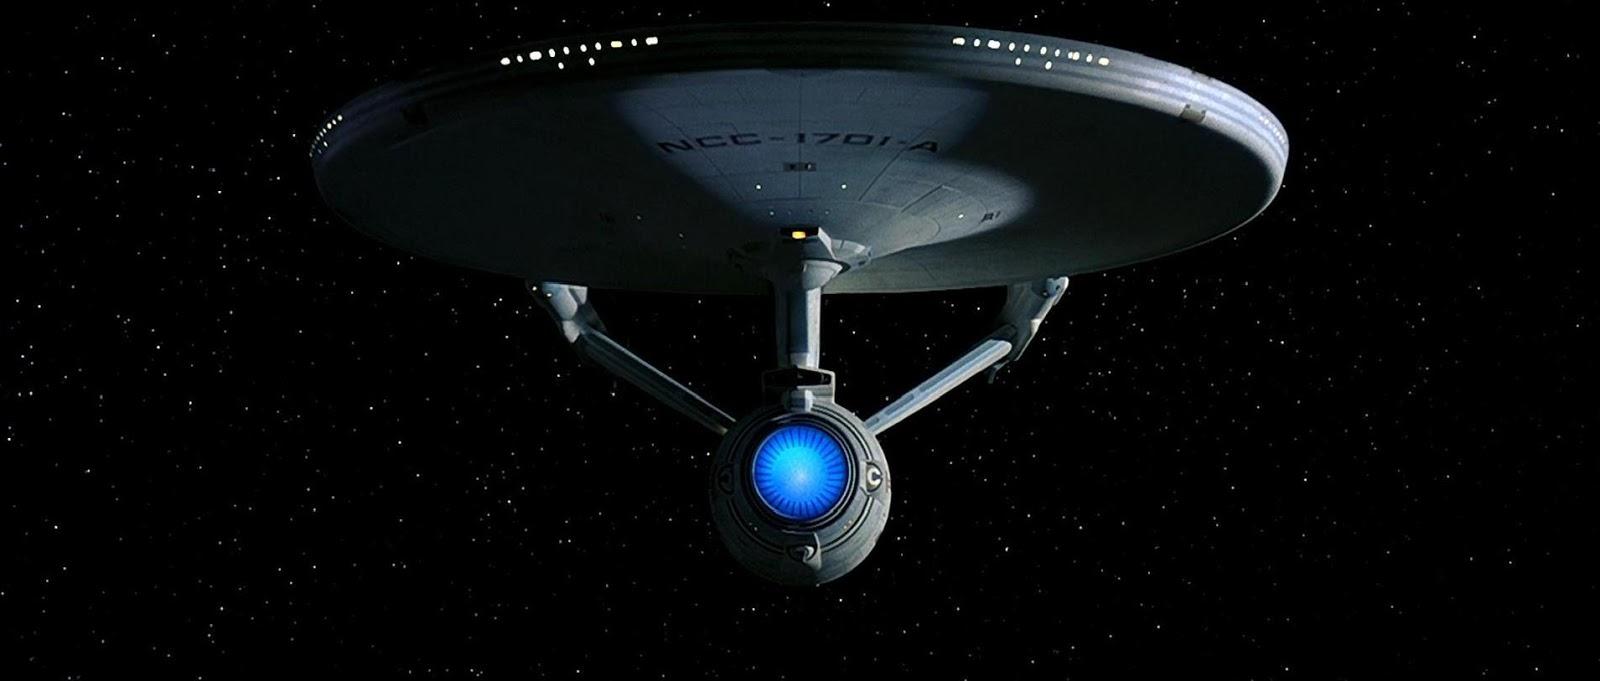 USS_Enterprise_%28NCC-1701-A%29_auf_dem_Weg_nach_Khitomer.jpg